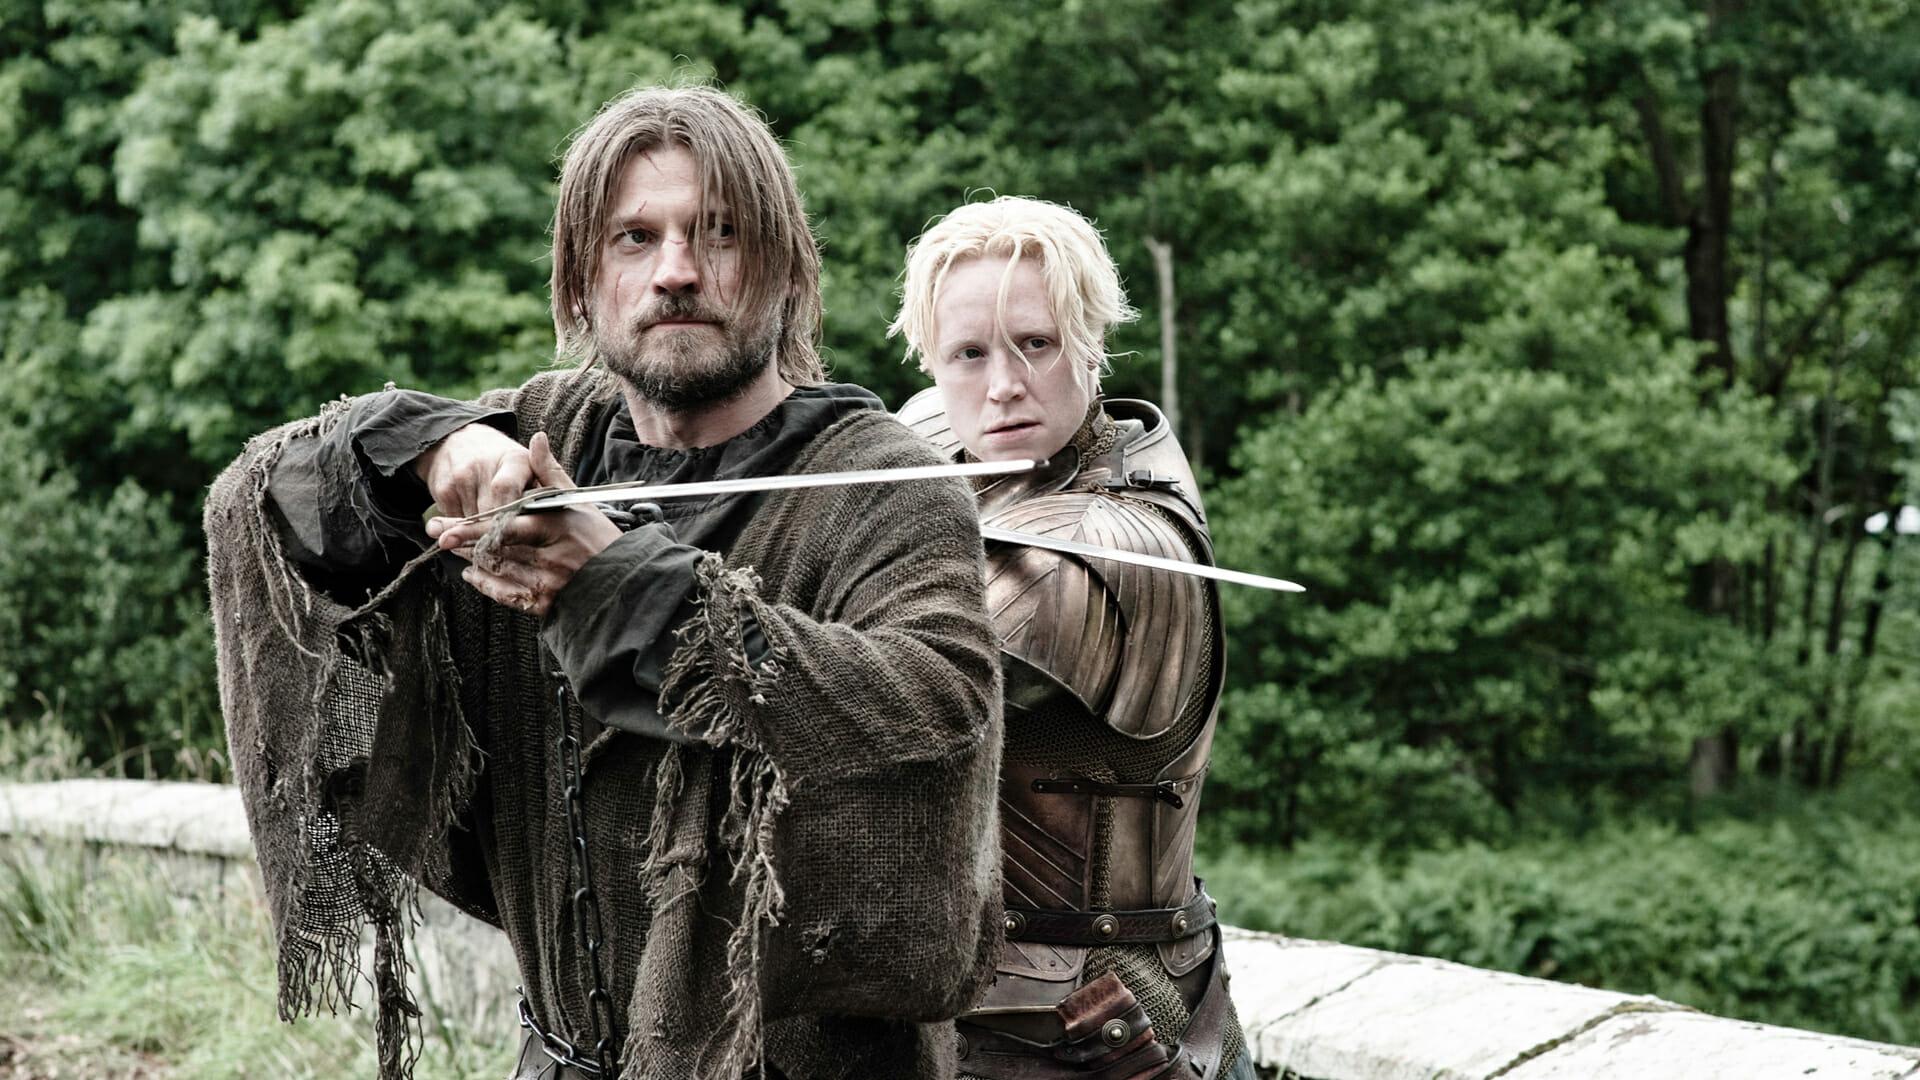 Nikolaj Coster-Waldau (Jaime Lannister) et Gwendoline Christie (Brienne De Torth)